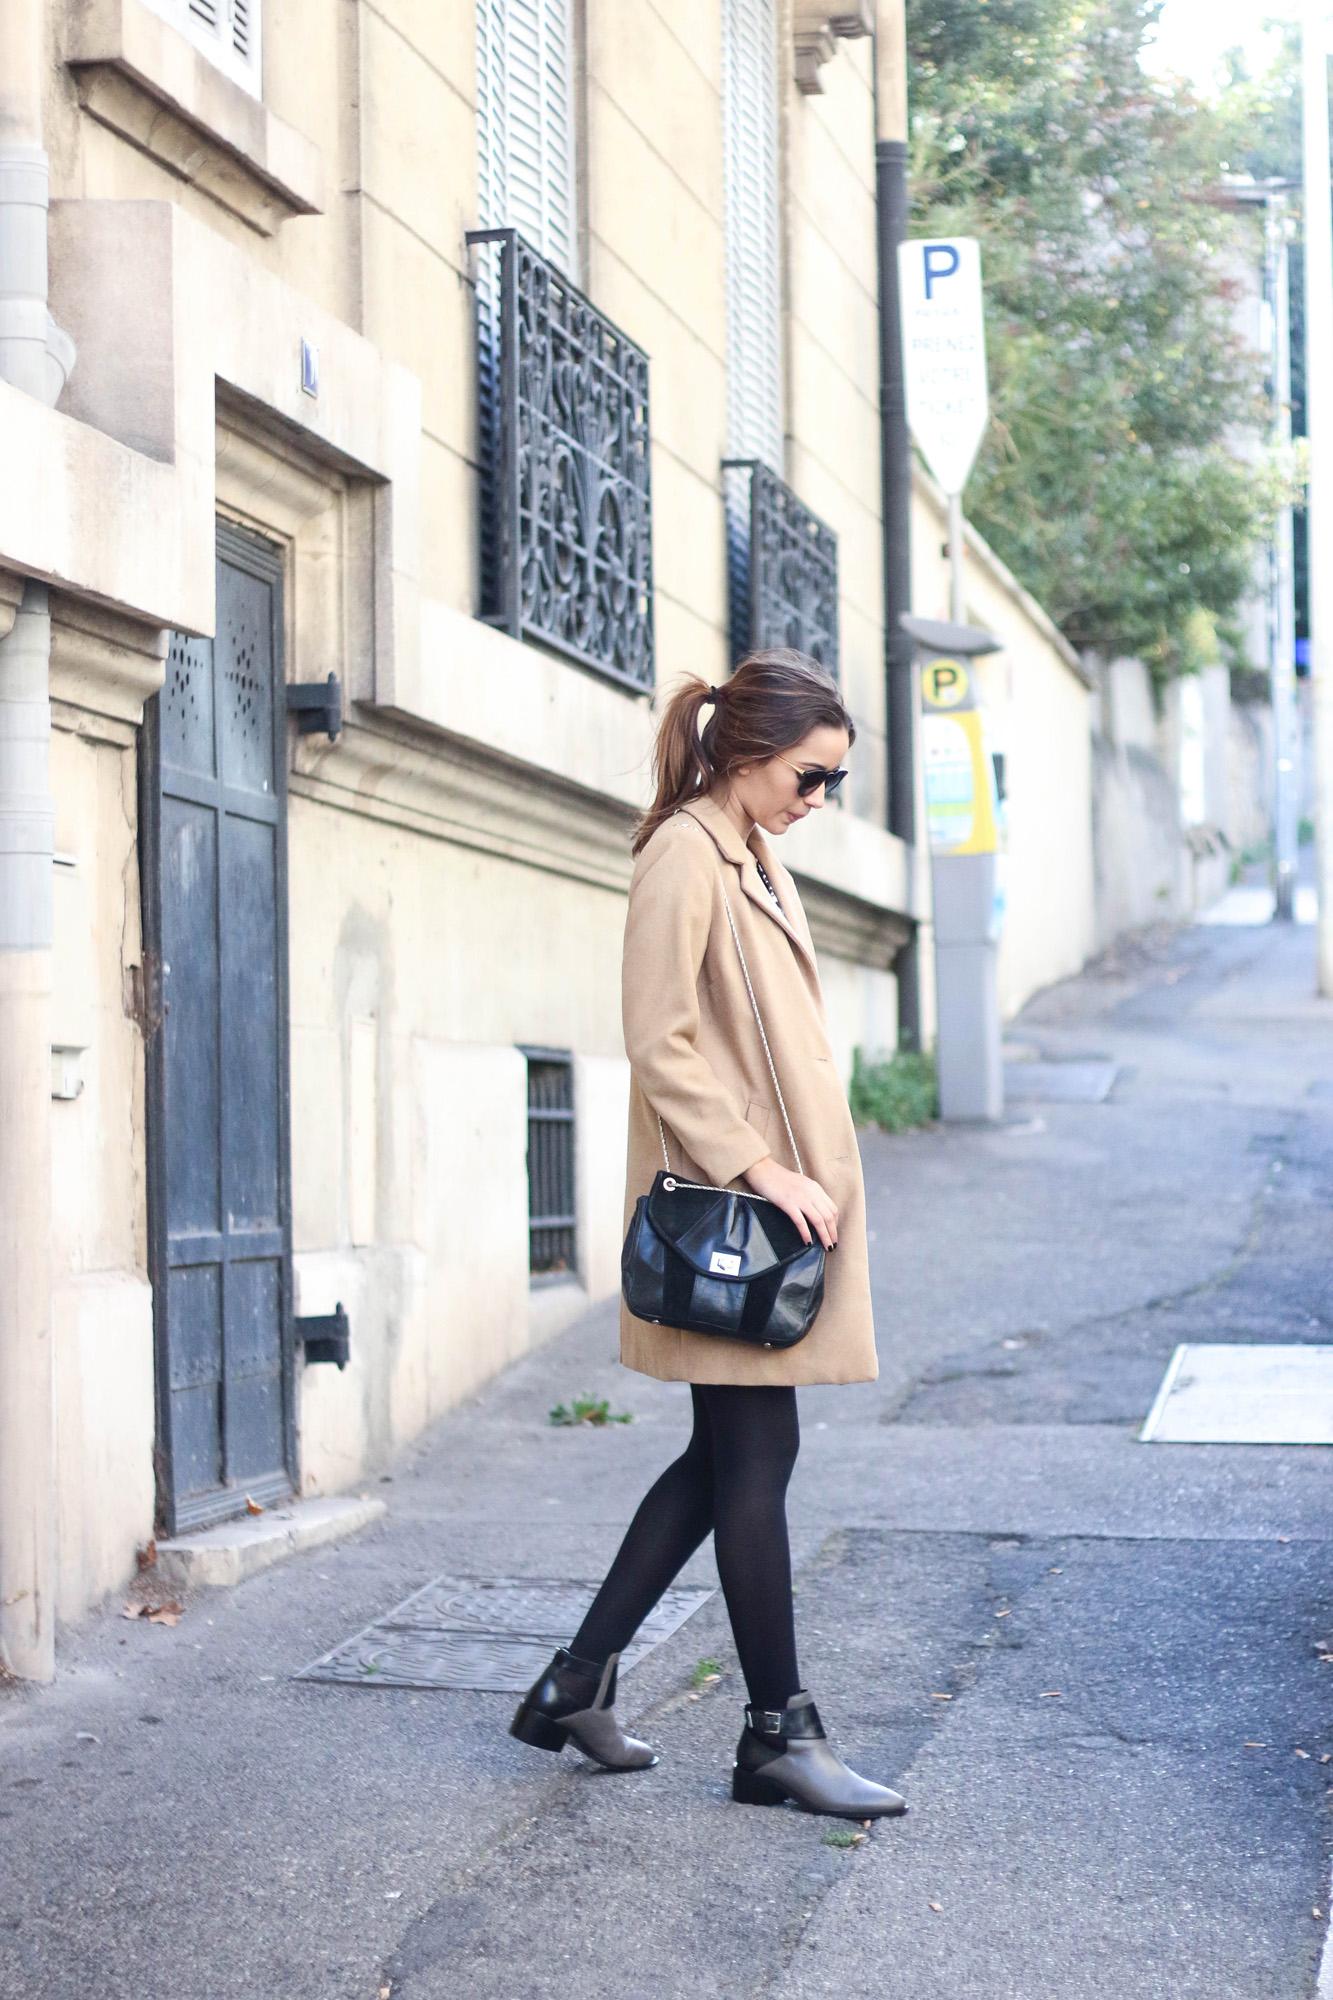 blog-mode-idee-look-tendance